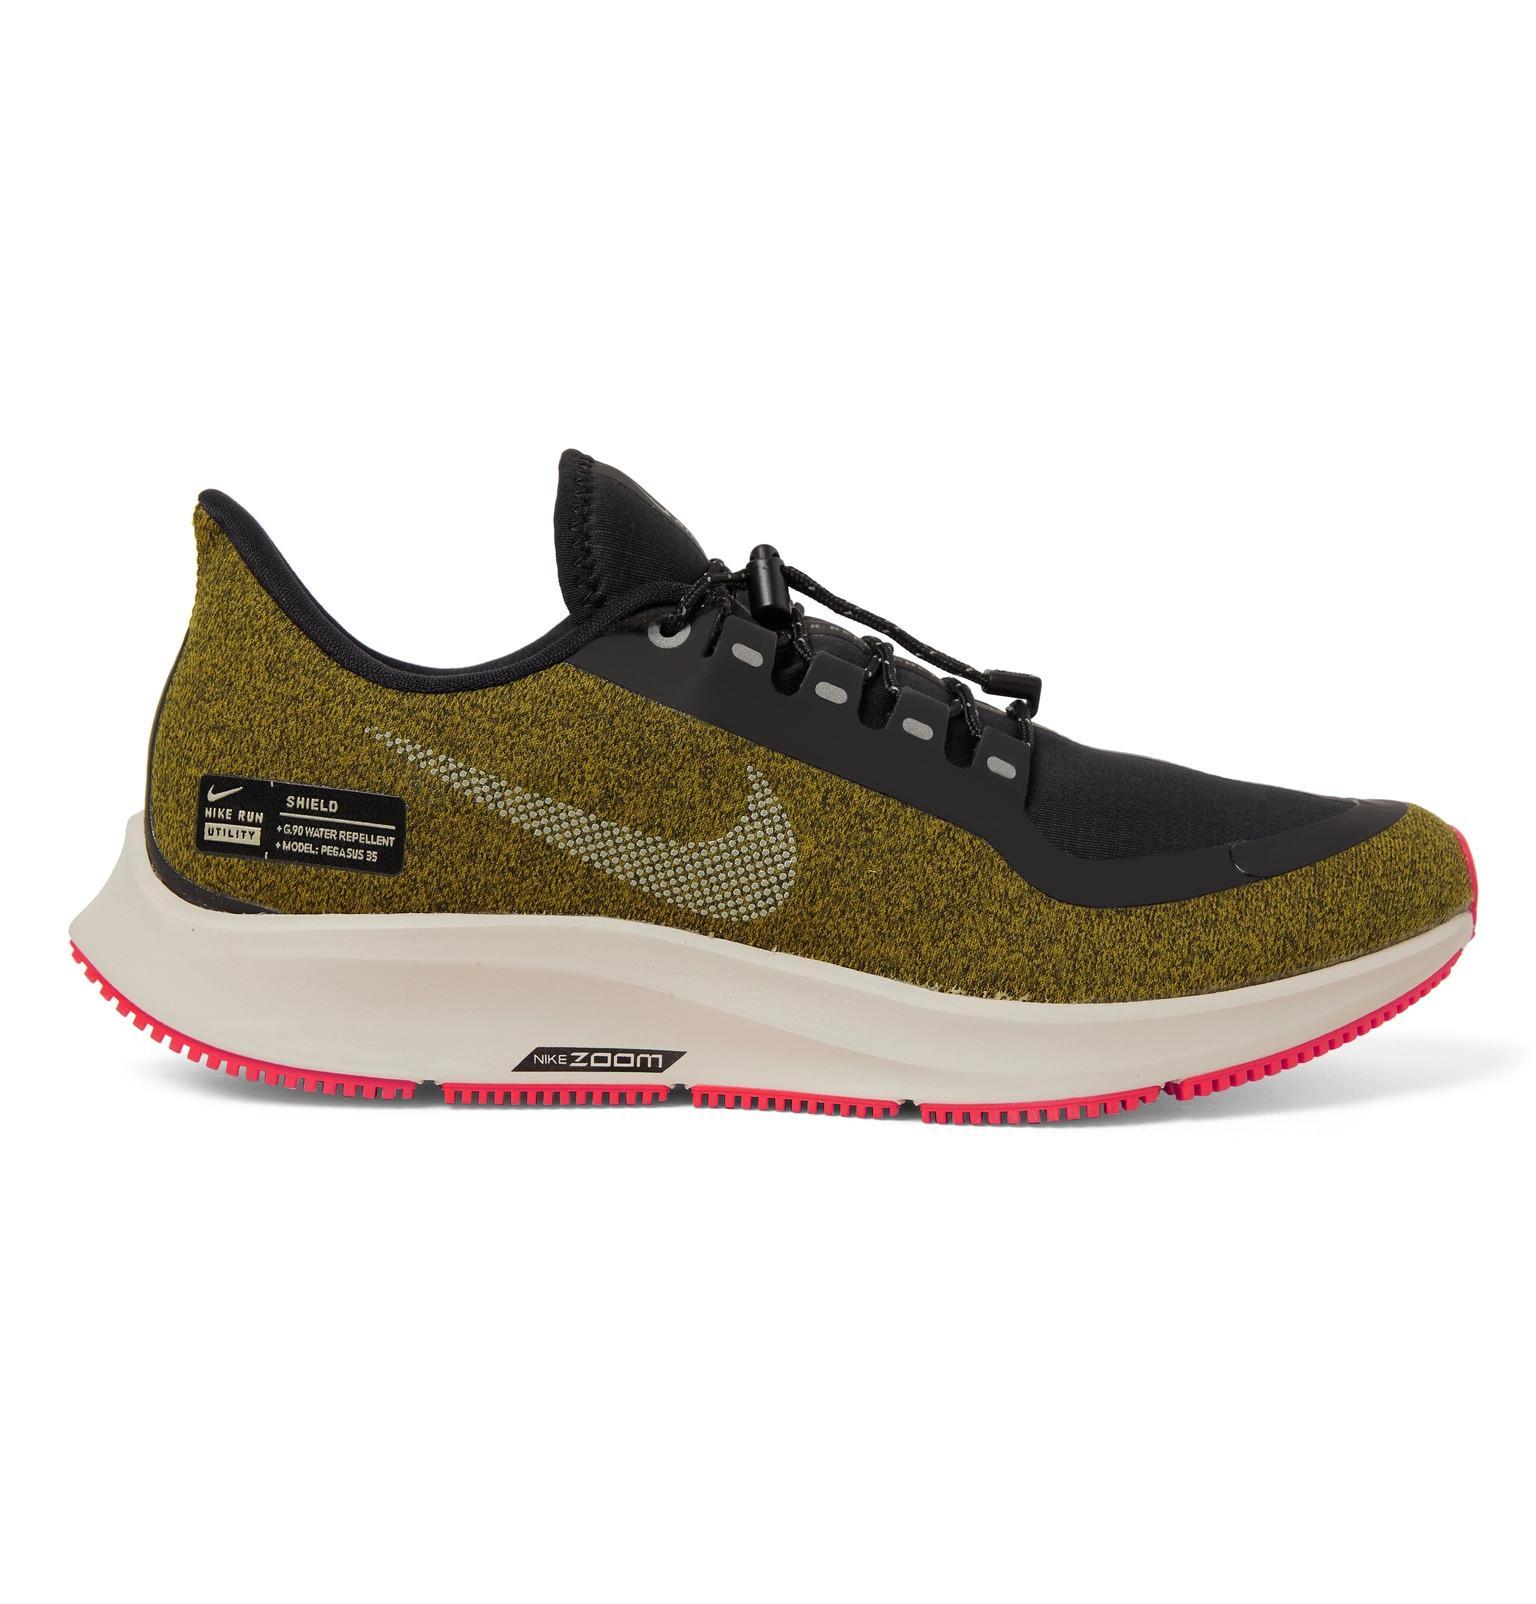 20c81fd449940 Lyst - Nike Air Zoom Pegasus 35 Shield Water-repellent Sneakers in ...